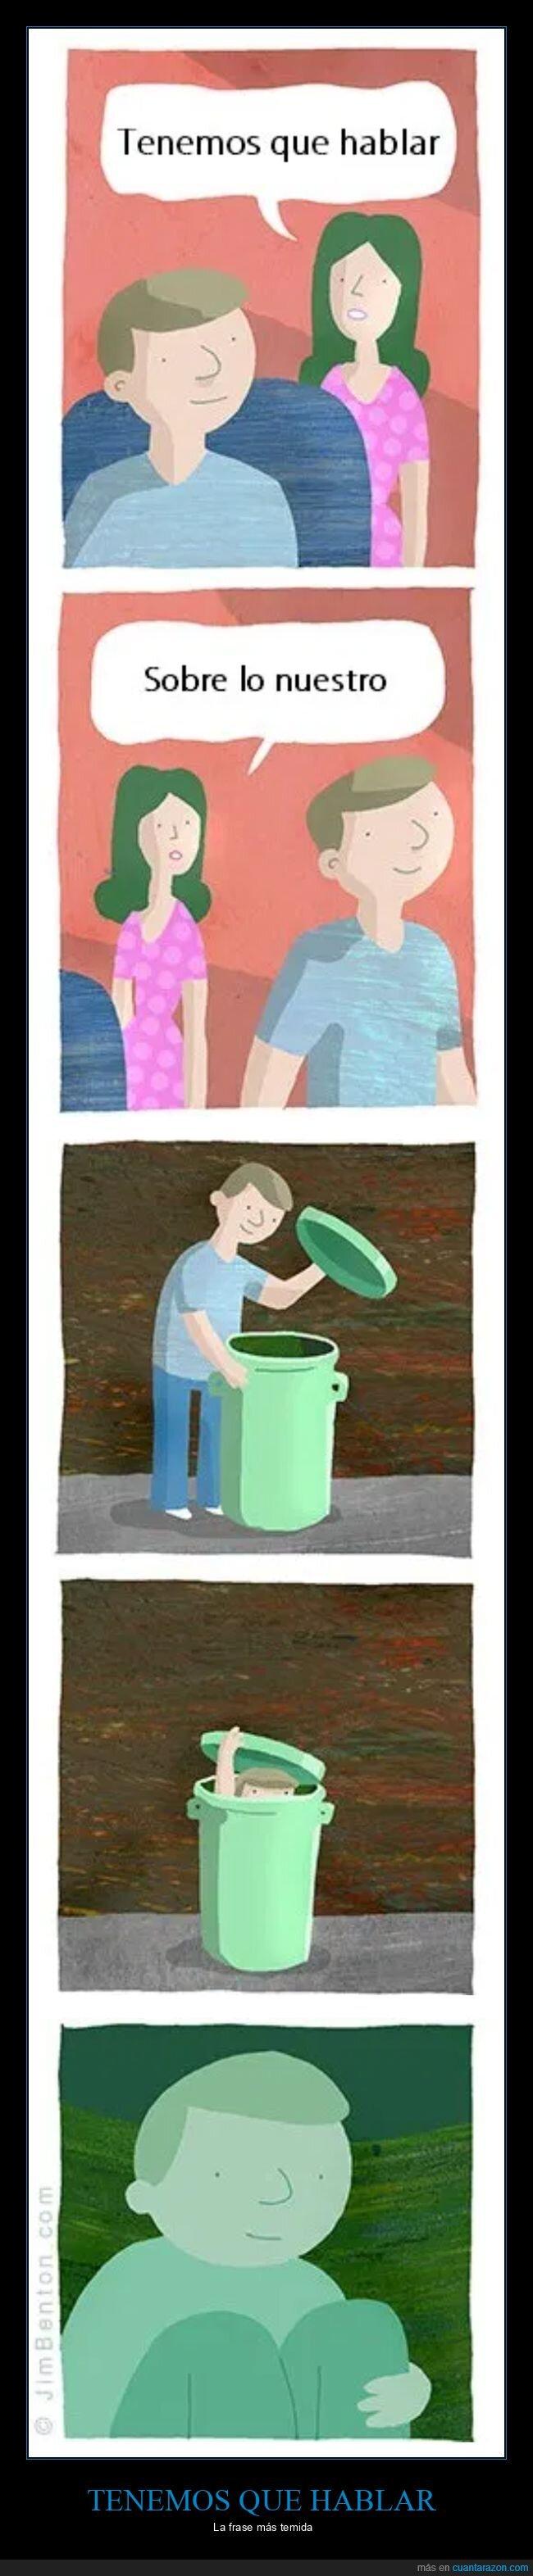 basura,hablar,pareja